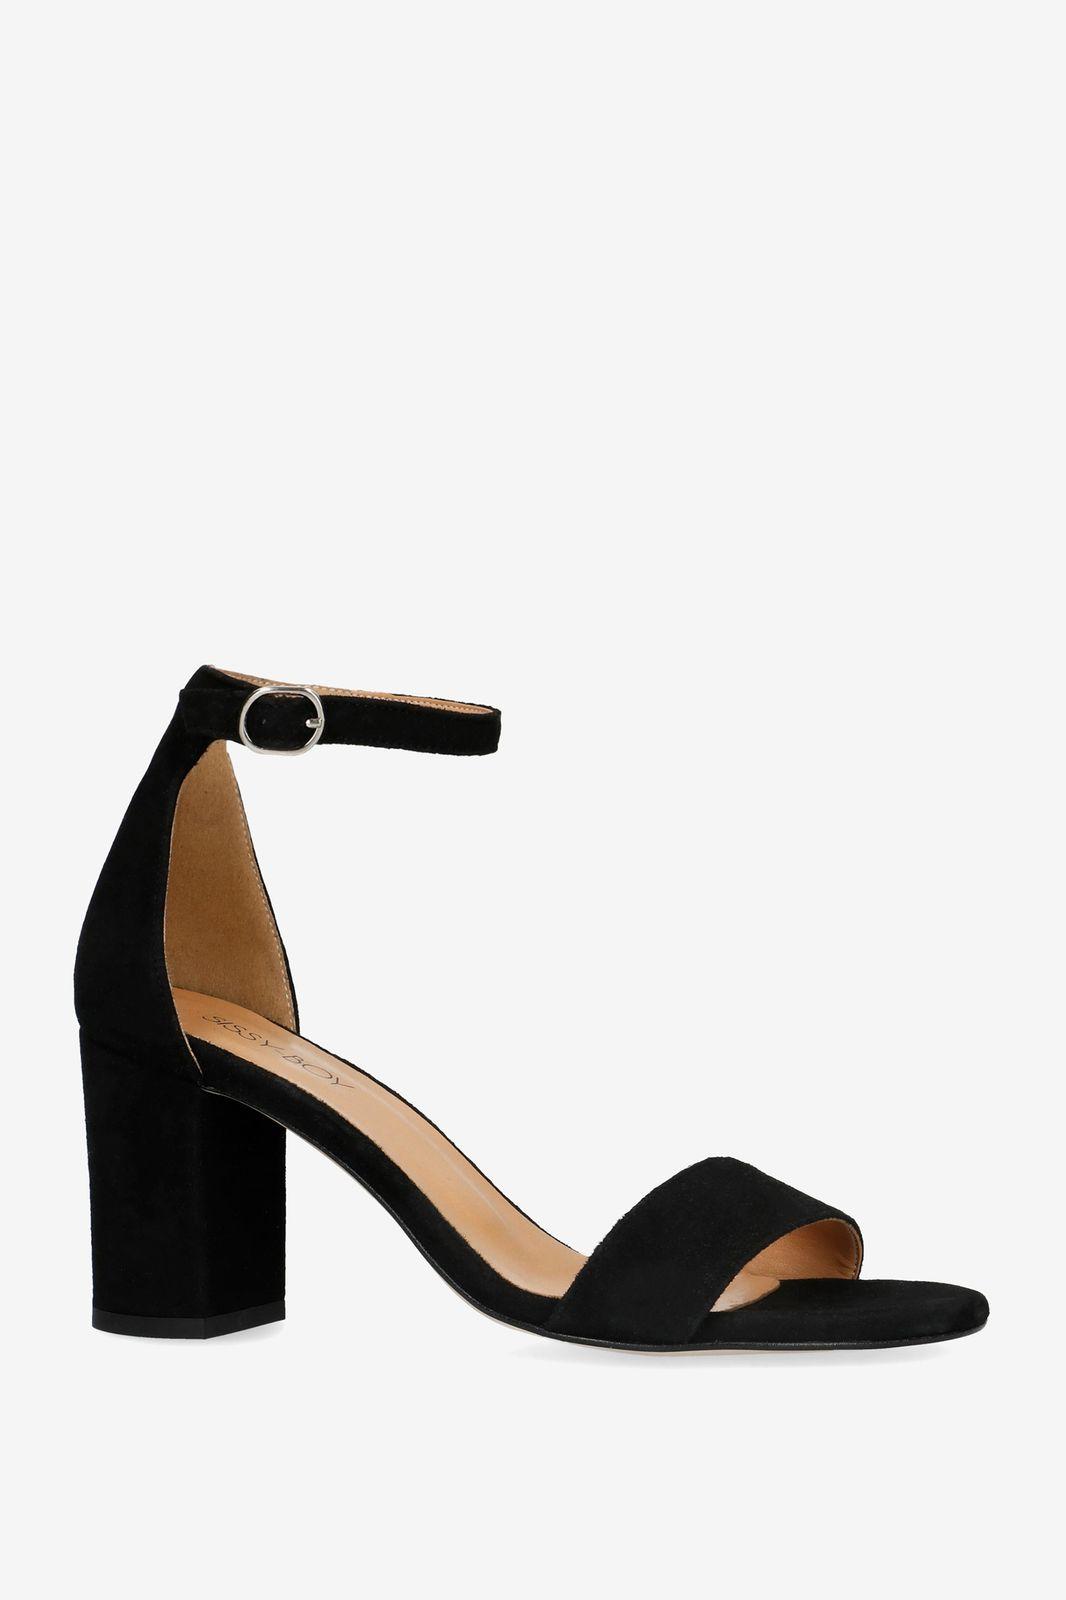 Zwarte sandalen met hak - Dames | Sissy-Boy